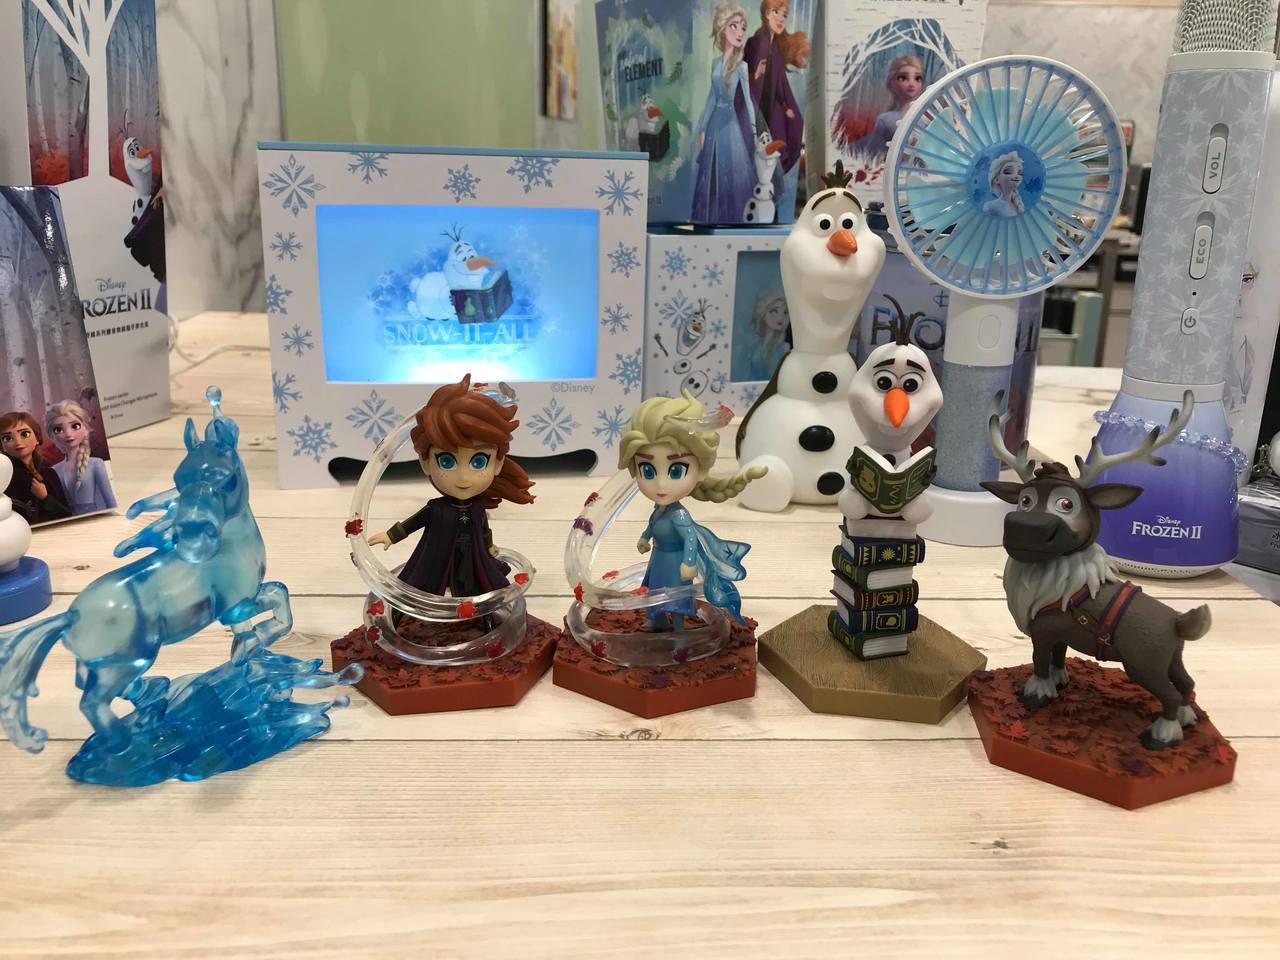 7-ELEVEN推出野獸國《冰雪奇緣2》蛋擊系列肖像公仔,售價299元,共5款。...